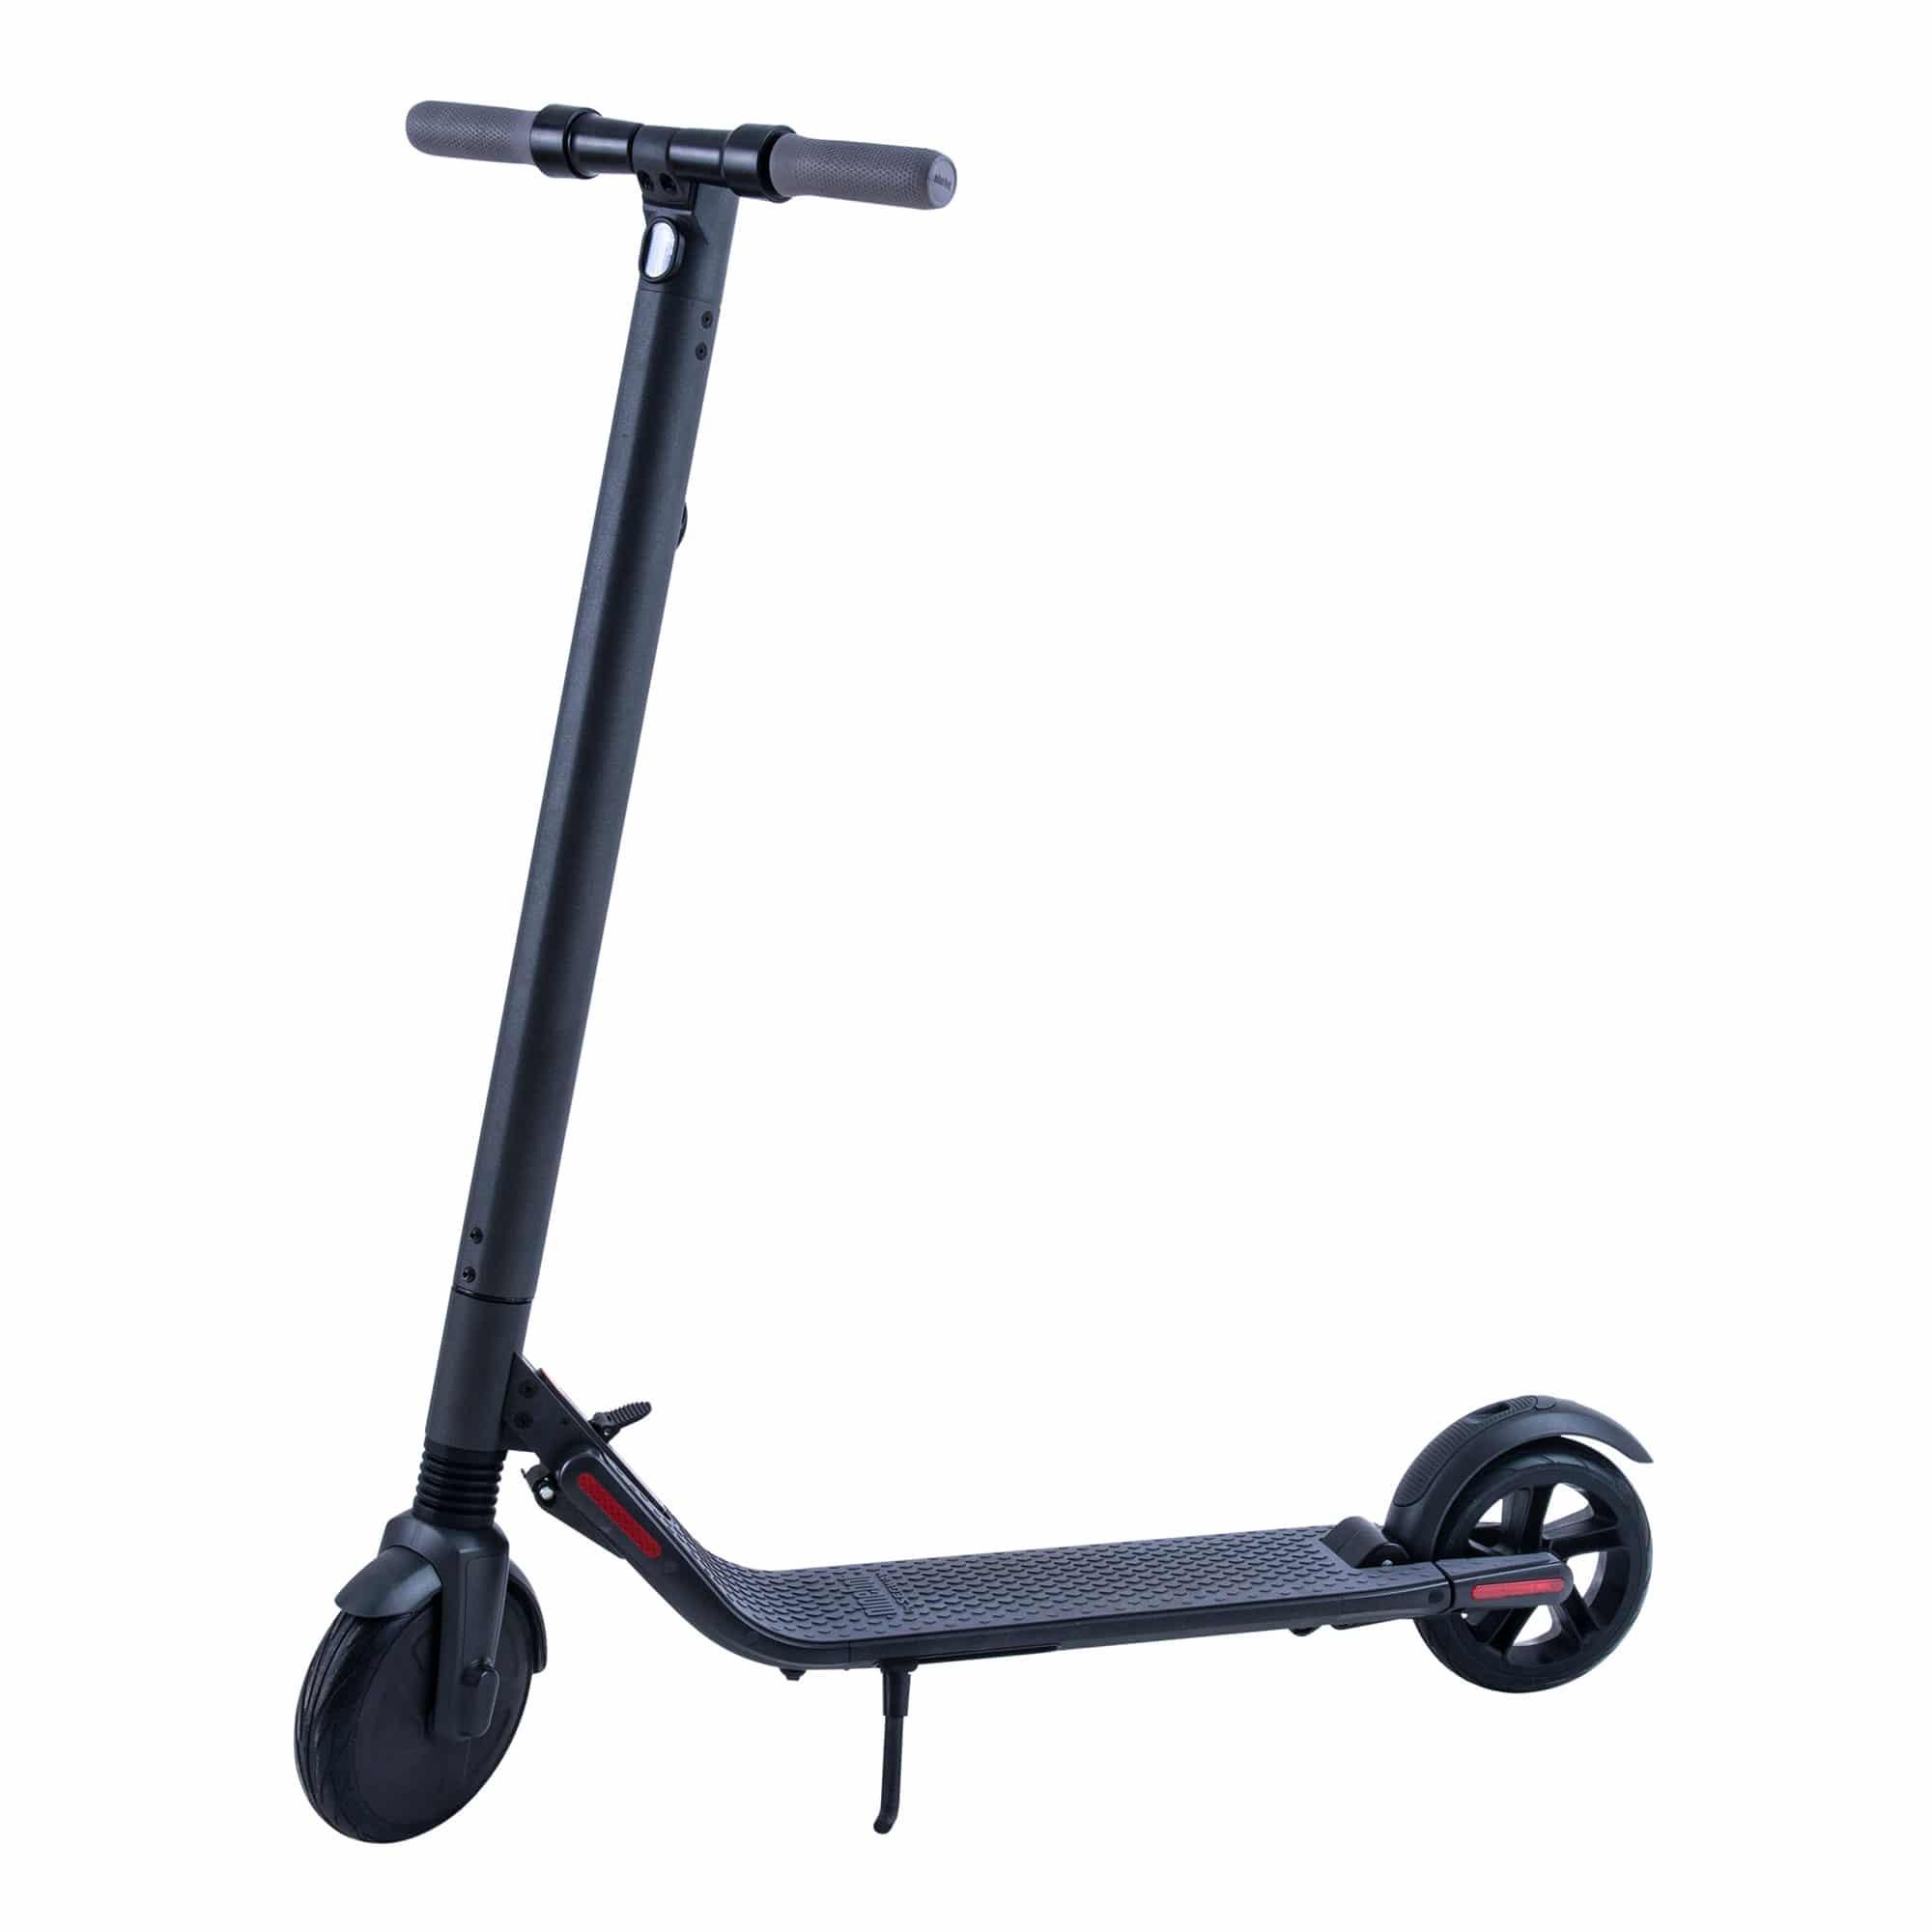 Zsnake Electric Scooter - Zwheel